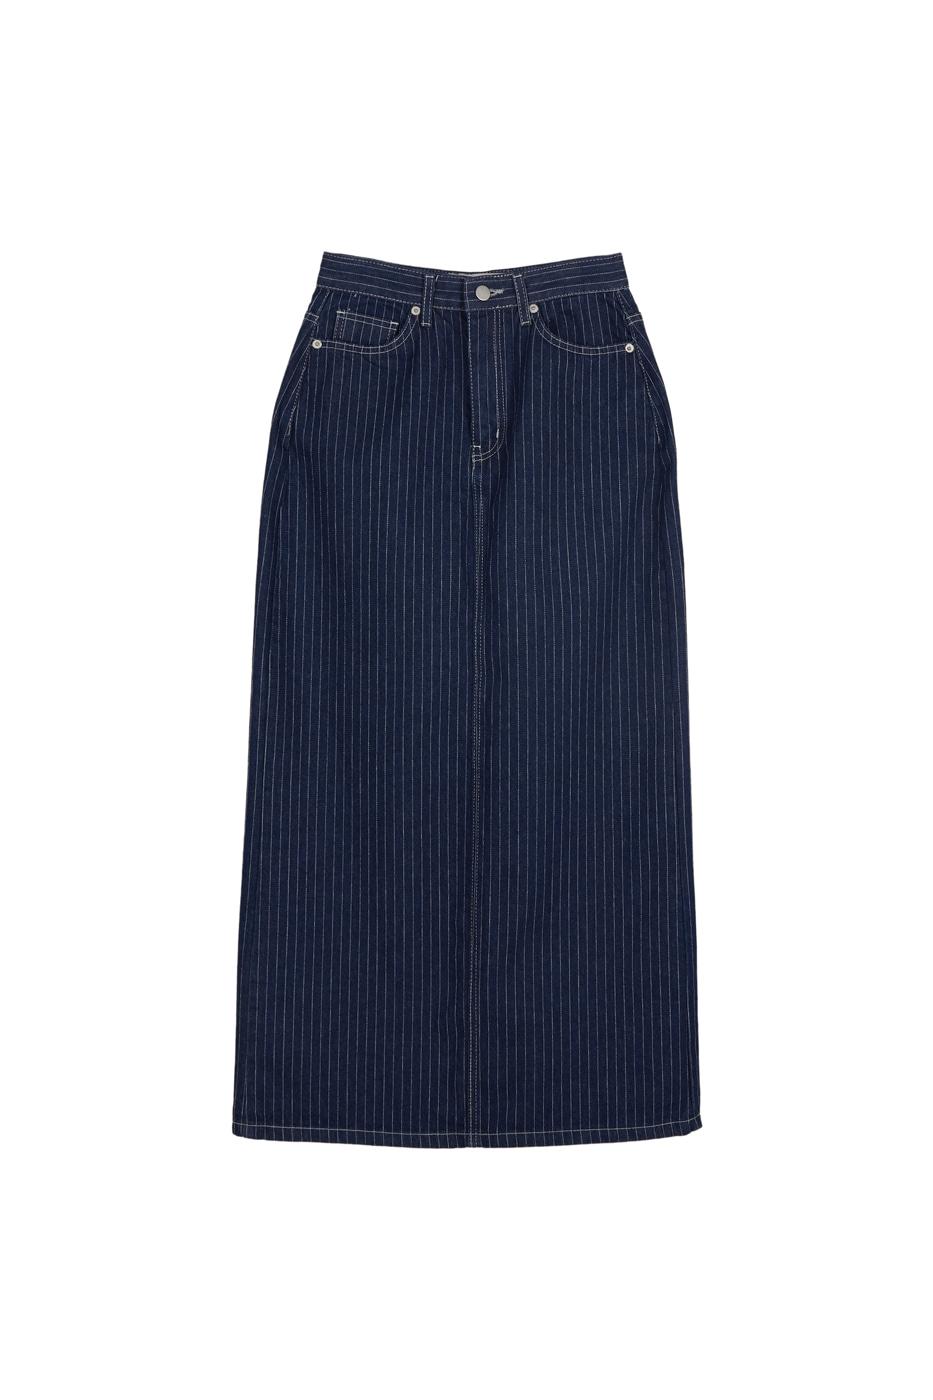 Retro striped maxi skirt